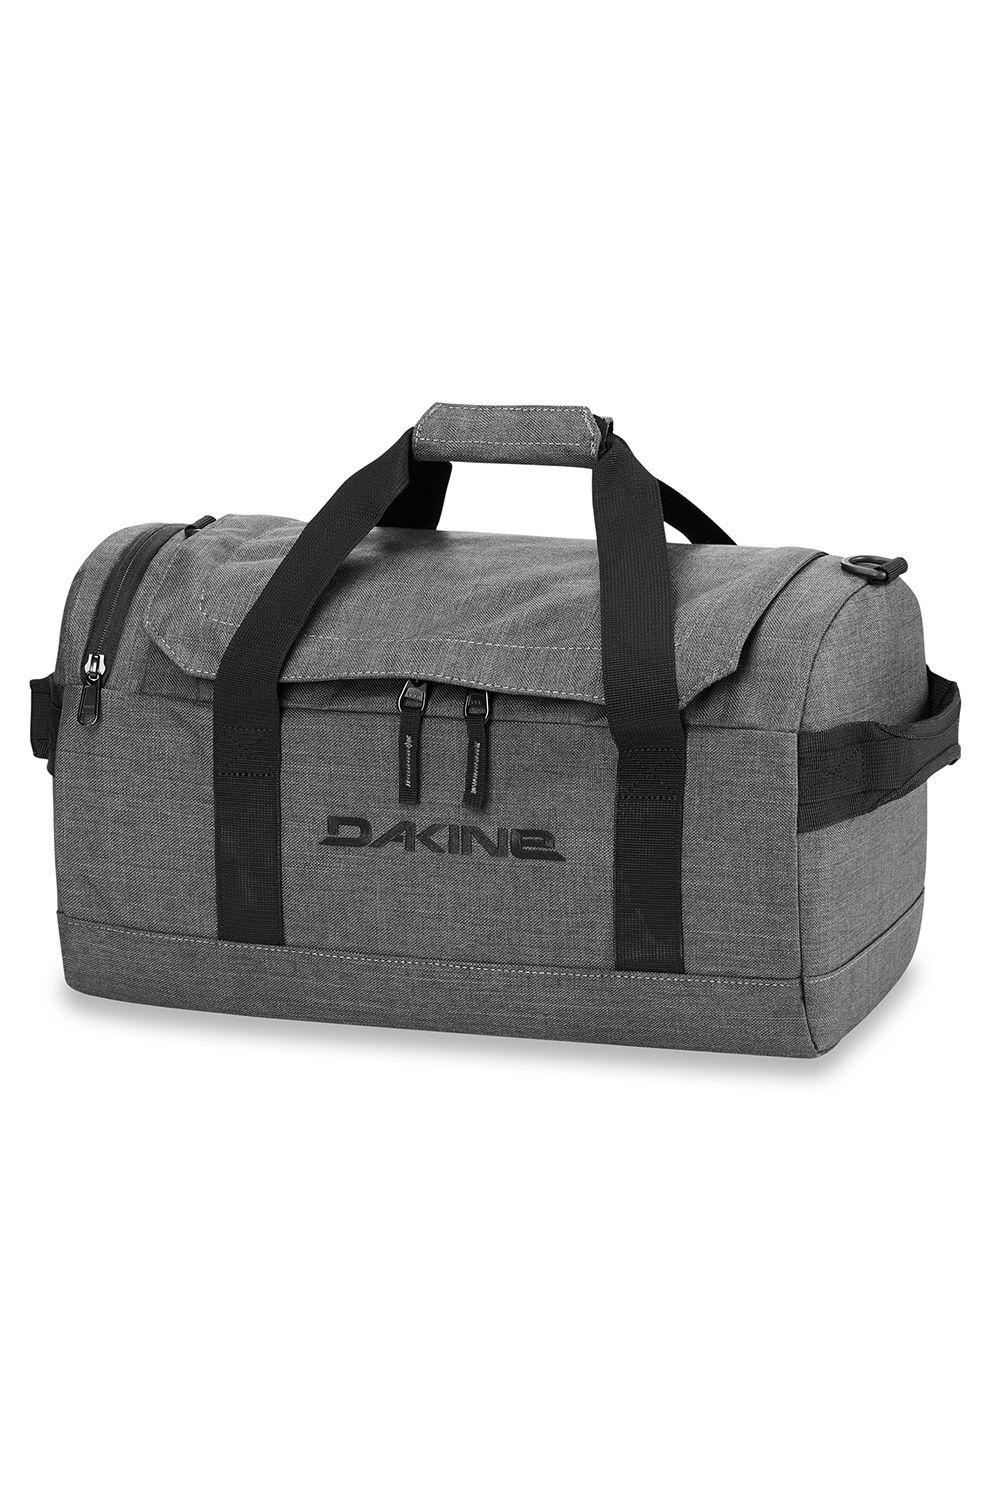 Dakine Bag EQ DUFFLE 25L Carbon